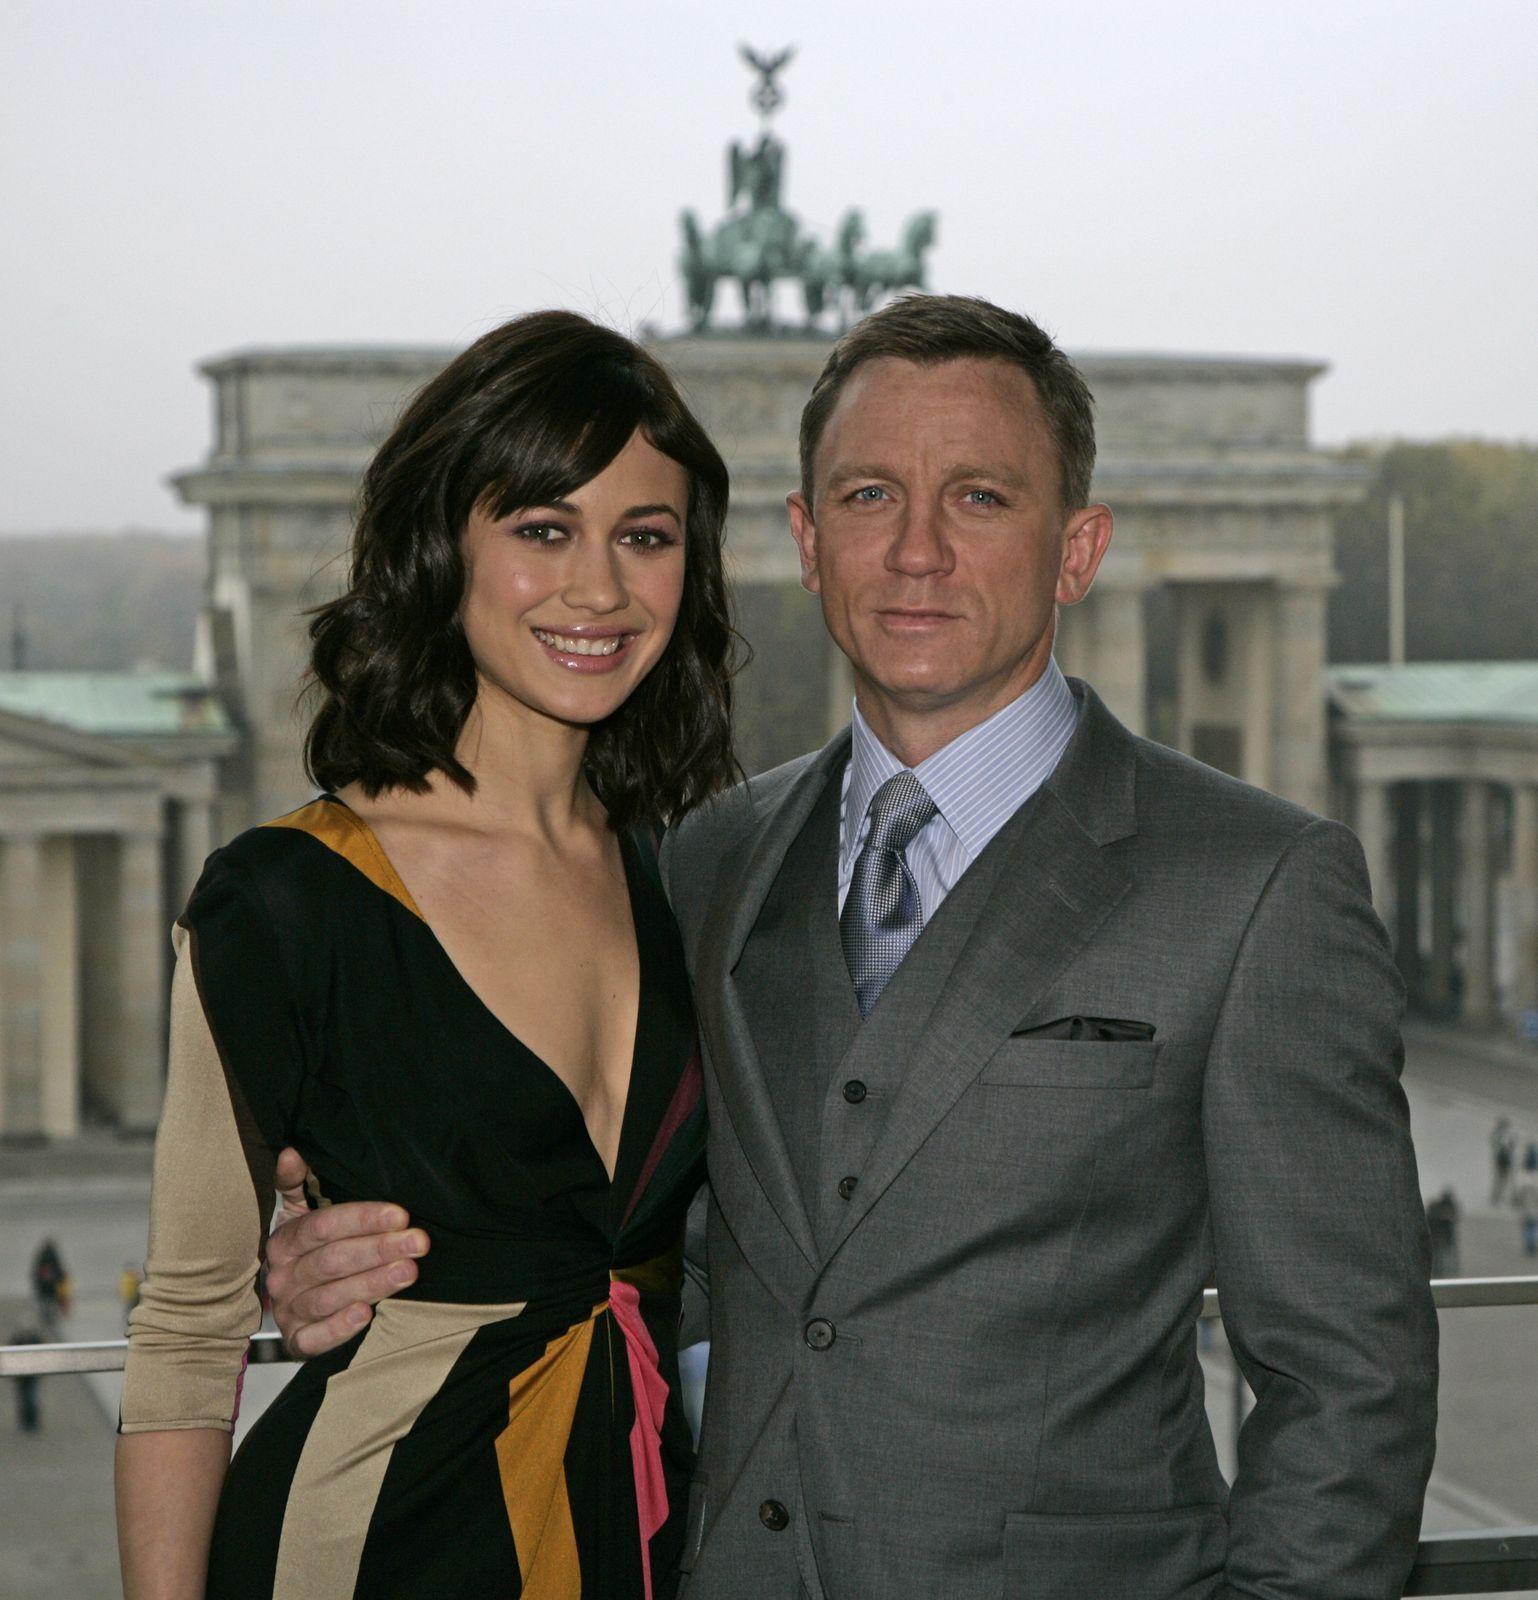 Olga Kurylenko   Photocall in Berlin w/ Daniel Craig